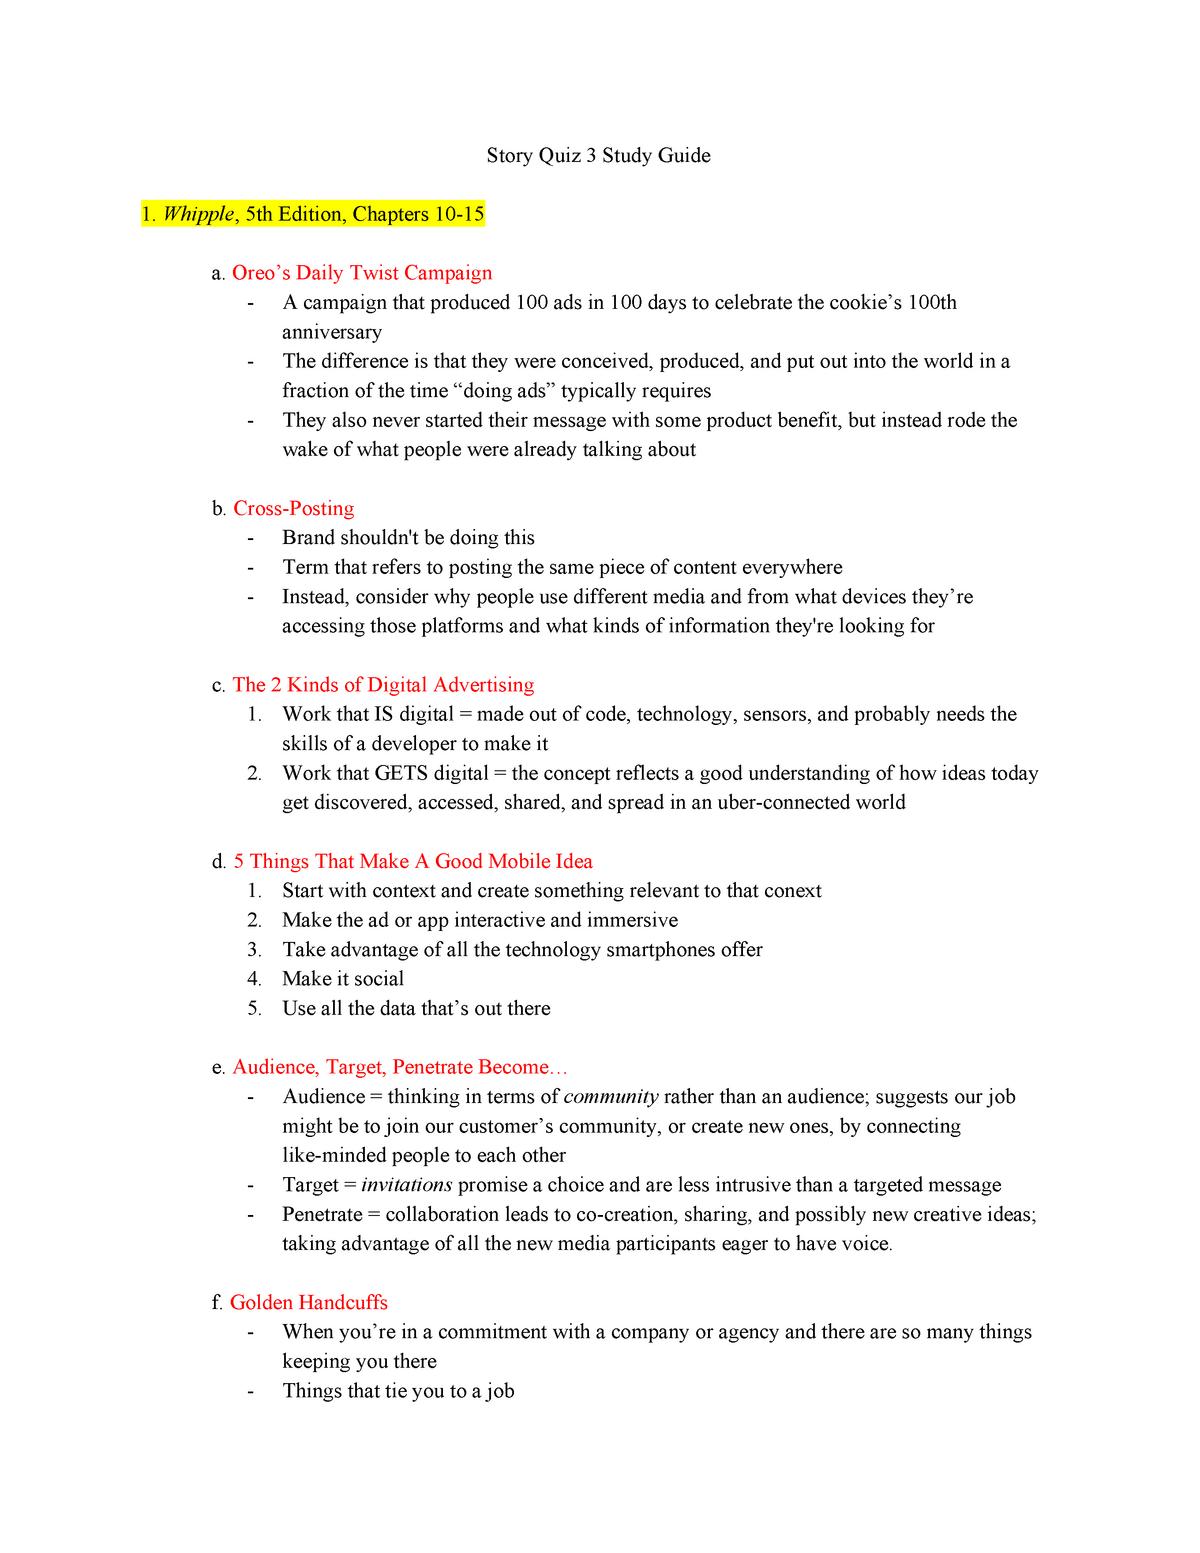 Quiz 3 Study Guide Professor Jennifer Sperberg Masc 204 Studocu